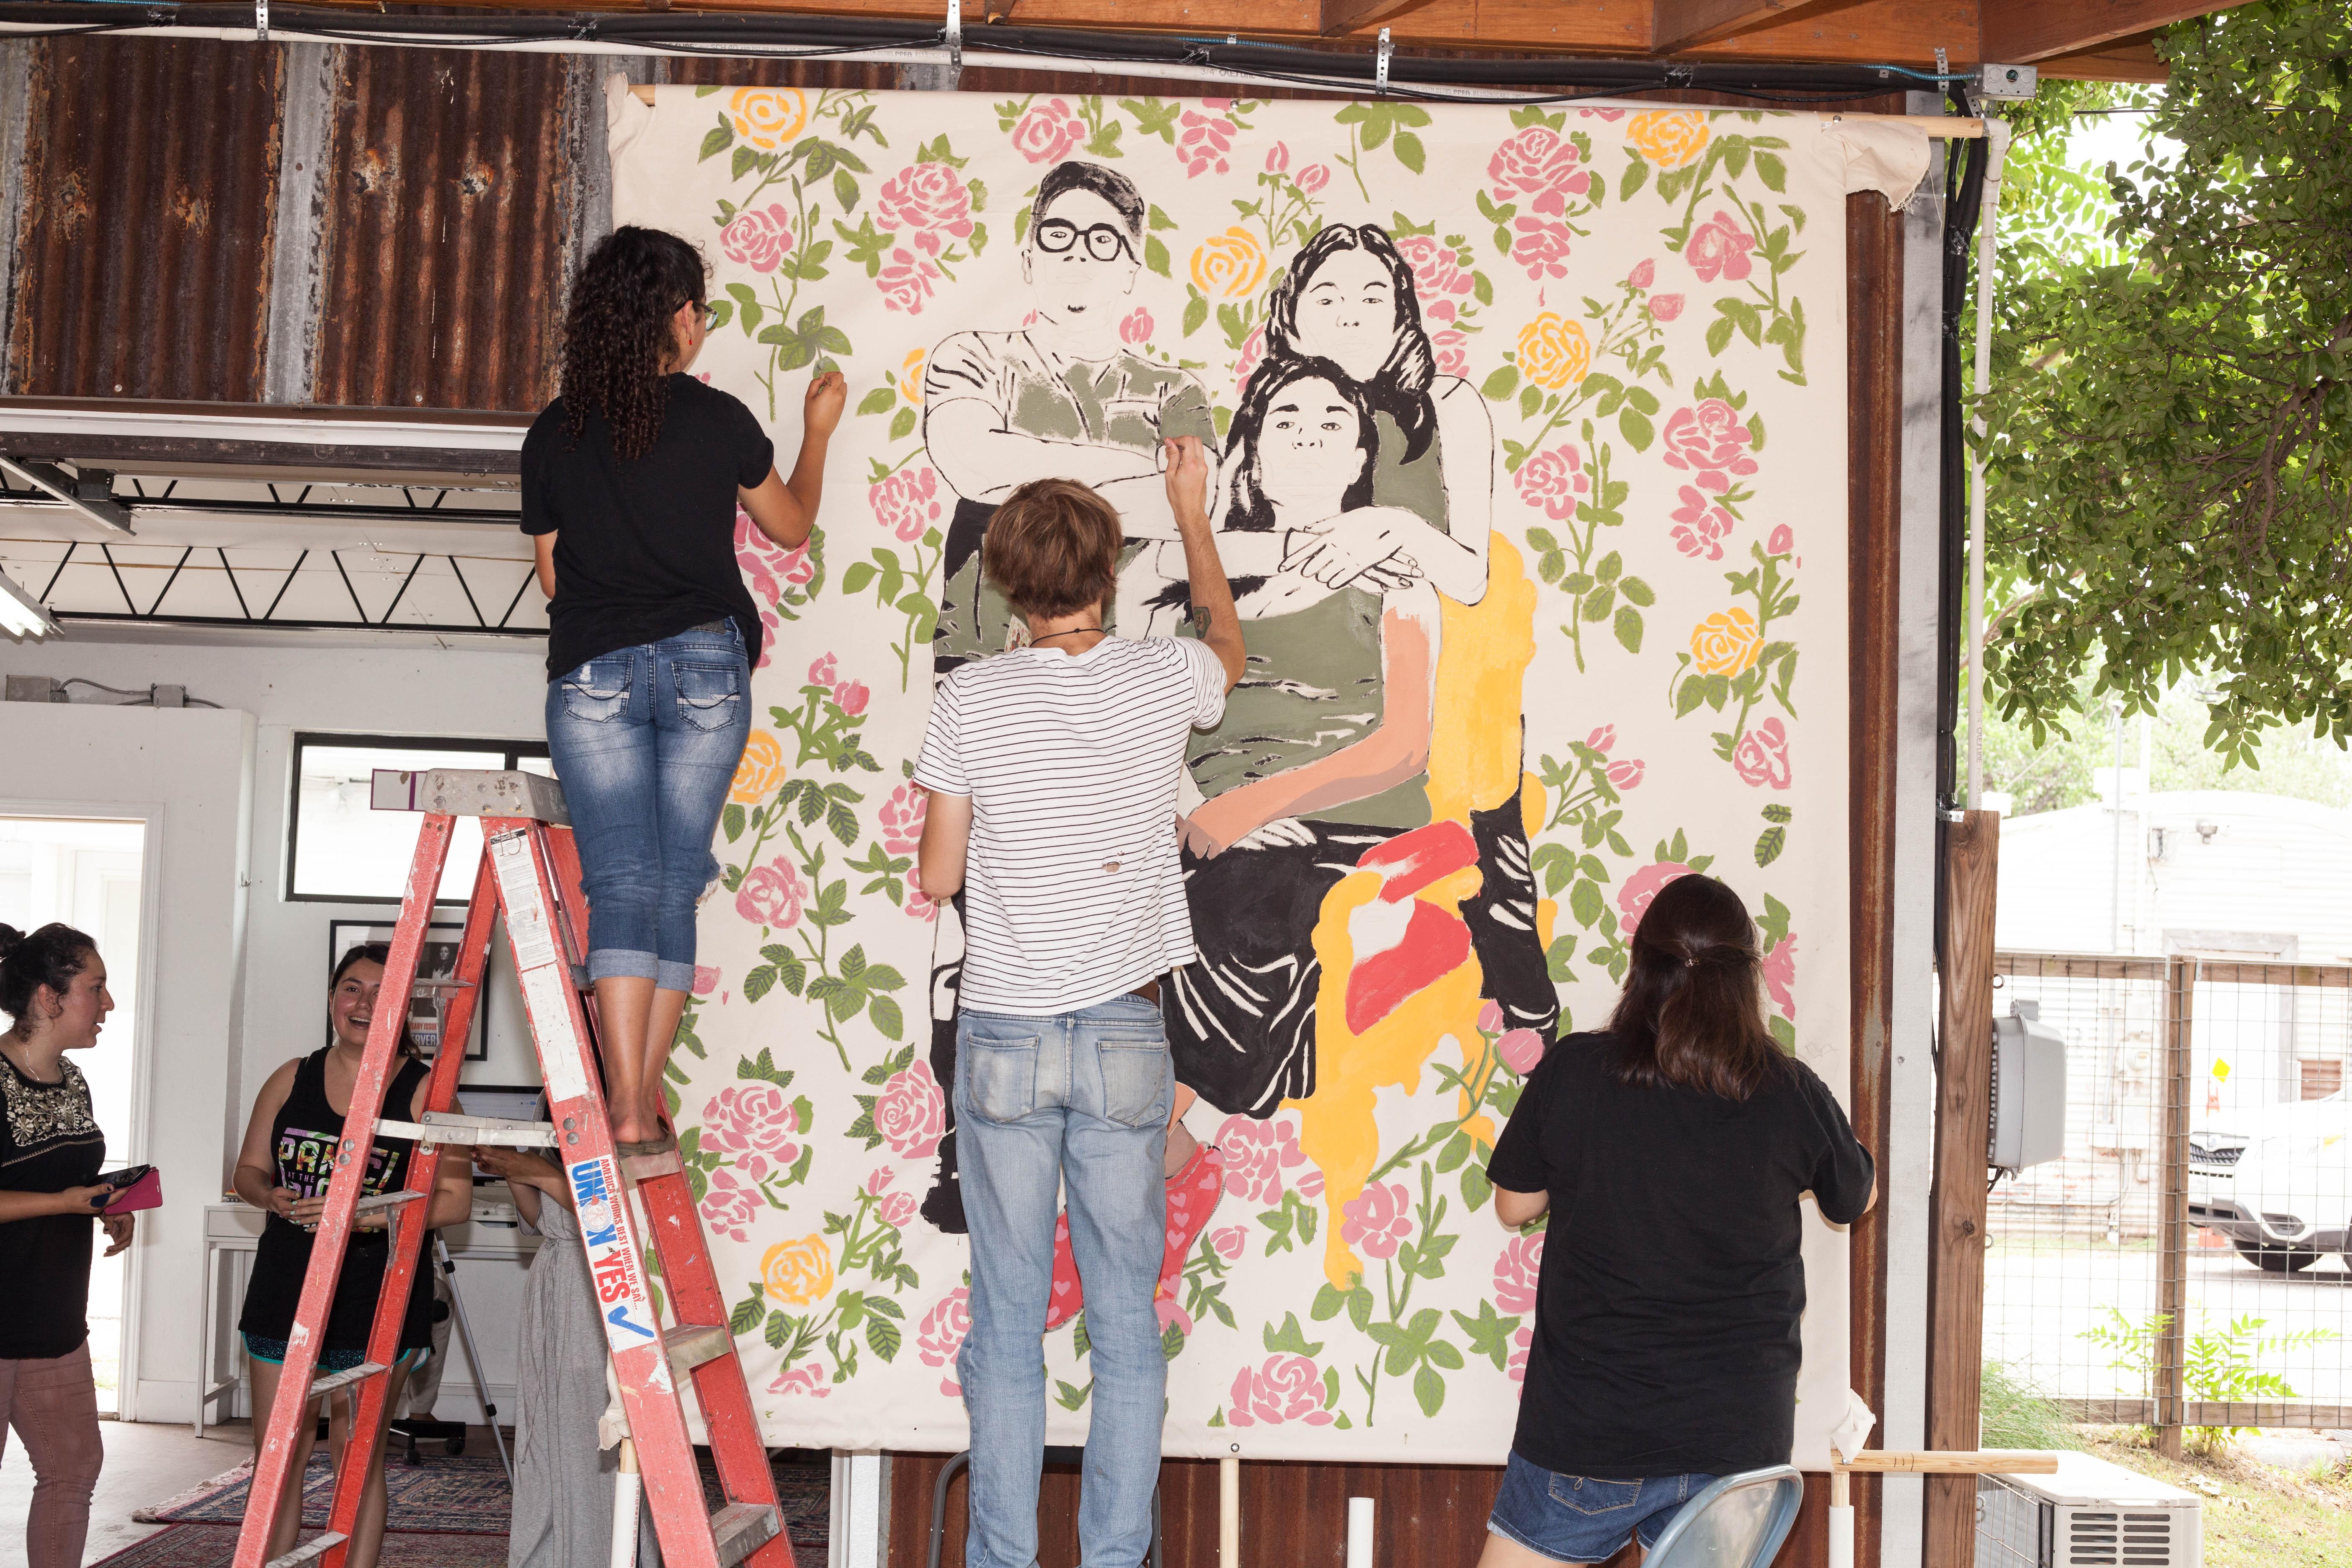 Austin 39 s poderosas mural is an homage to the sacrifices for Austin mural tour